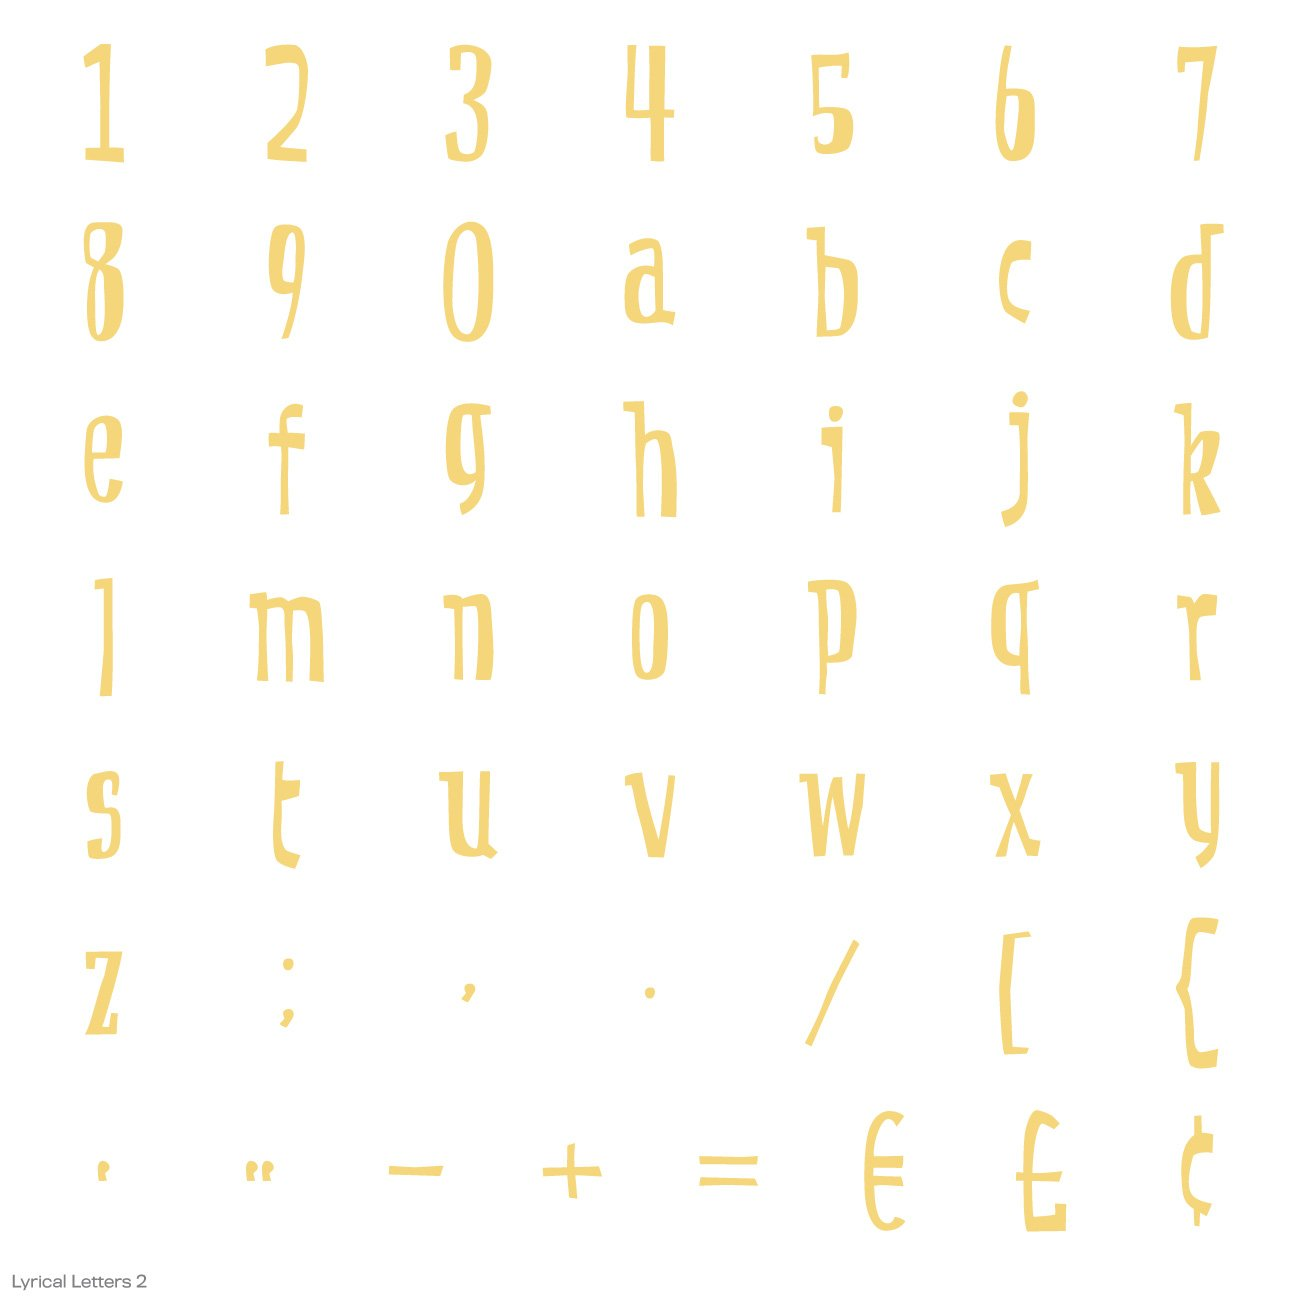 Cricut Lyrical Letters 2 Cartridge by Cricut (Image #10)